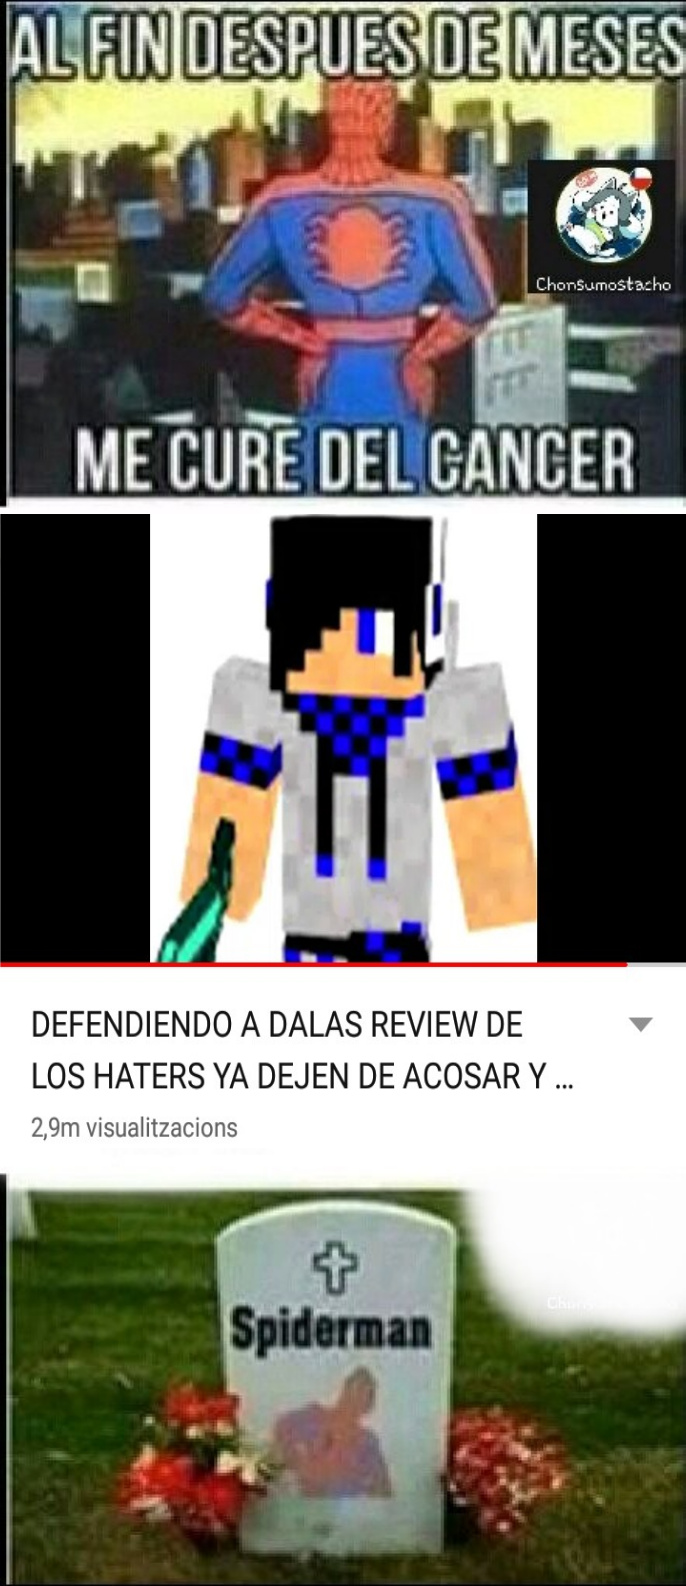 El titulo murio por cancer - meme